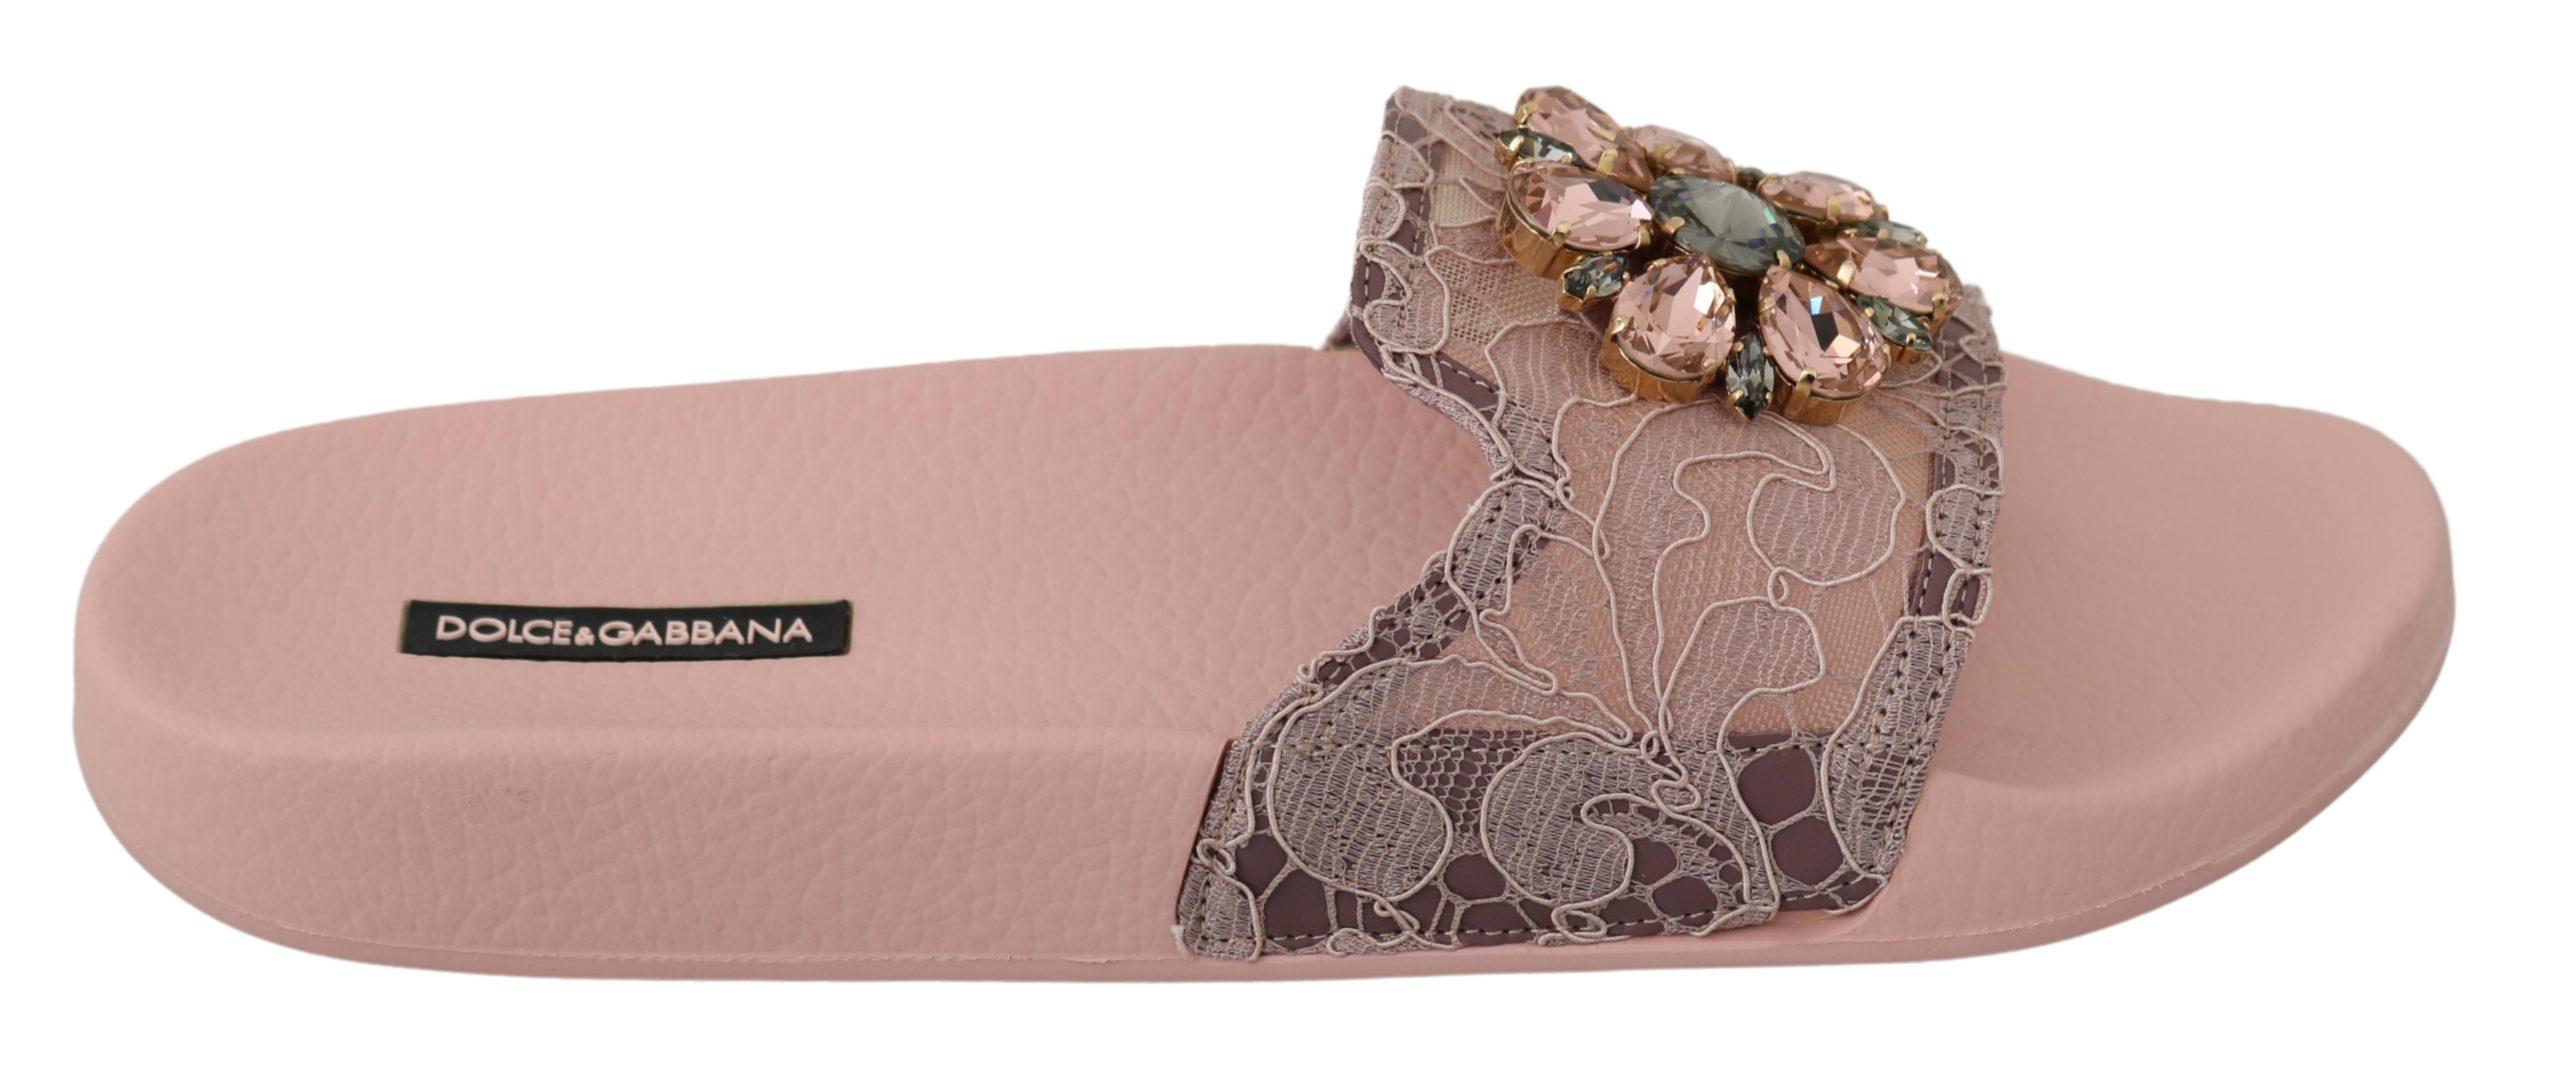 Dolce & Gabbana Women's Lace Crystal Sandals Pink LA6564 - EU36/US5.5